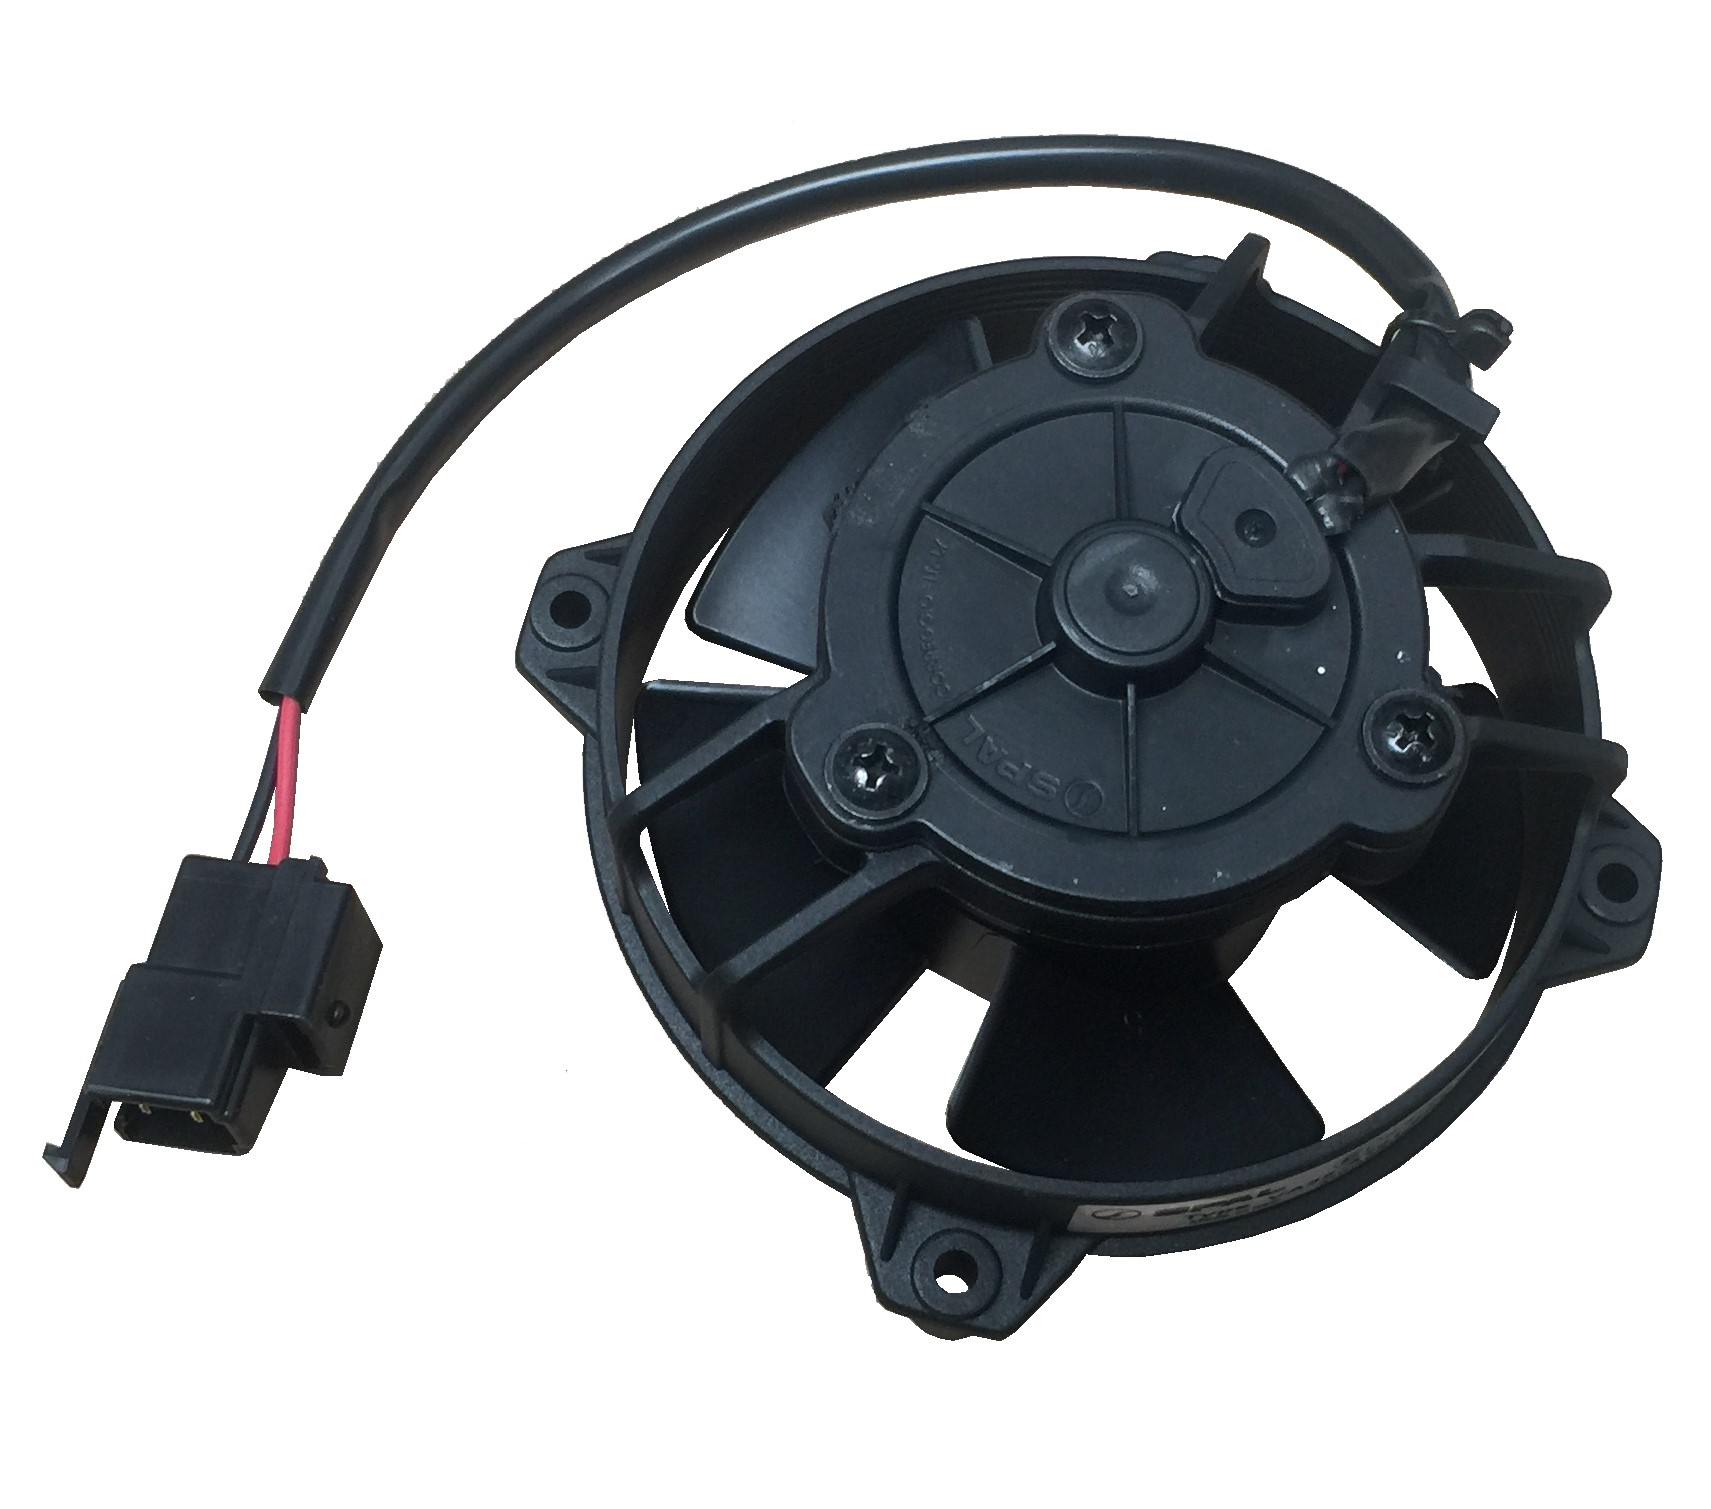 вентилятор сожги va32-a101-62a 12v - всасывающий 96mm